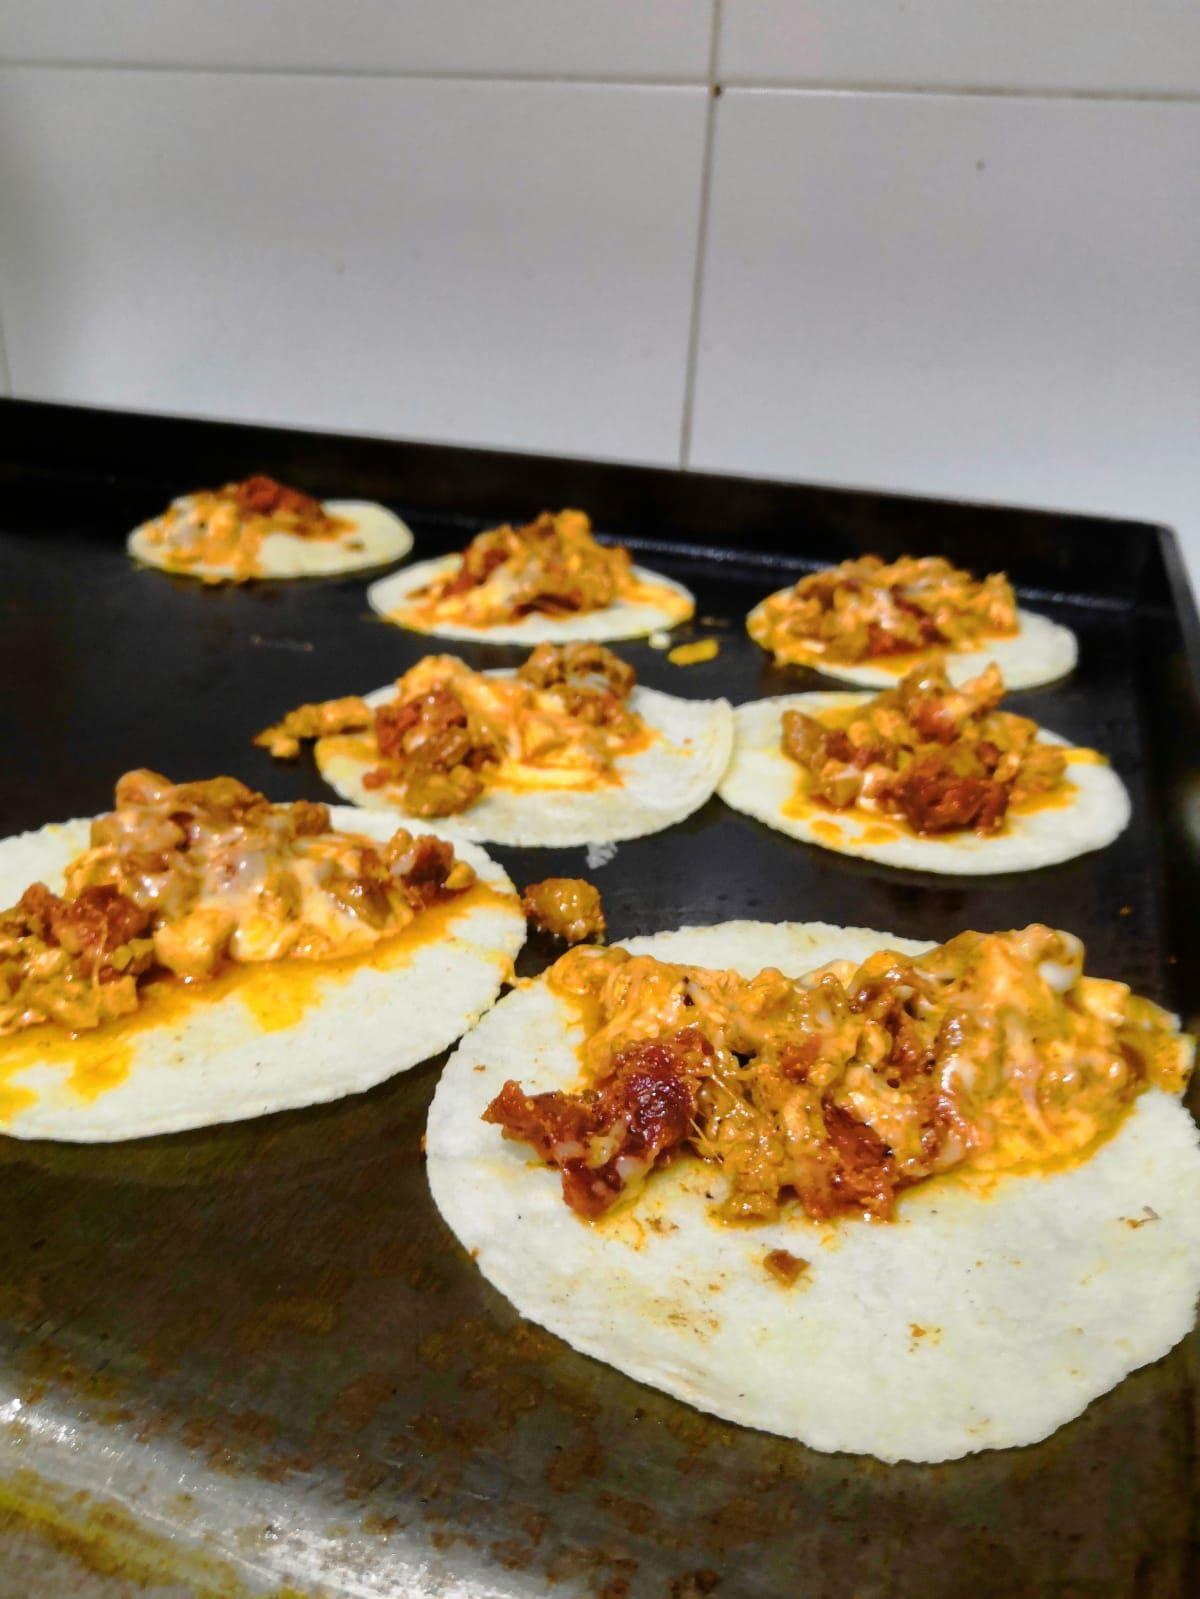 Foto 18 de Restaurante mexicano en  | Cantina La Catrina